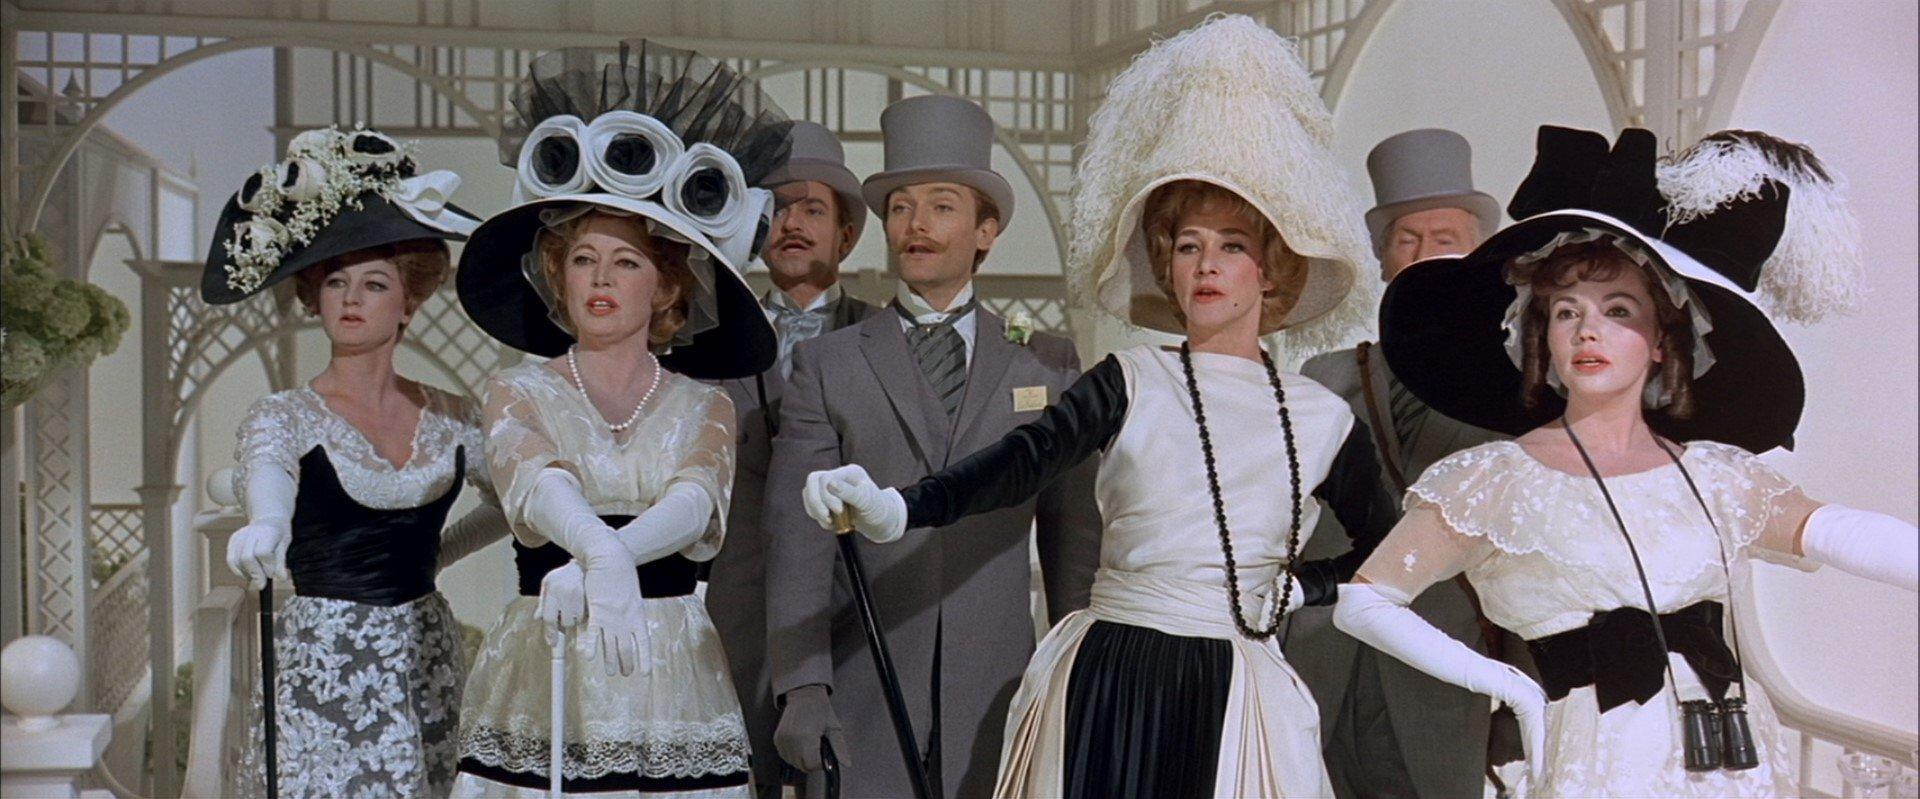 Scene Stealer: The Ascot Gavotte, My Fair Lady - flickfeast